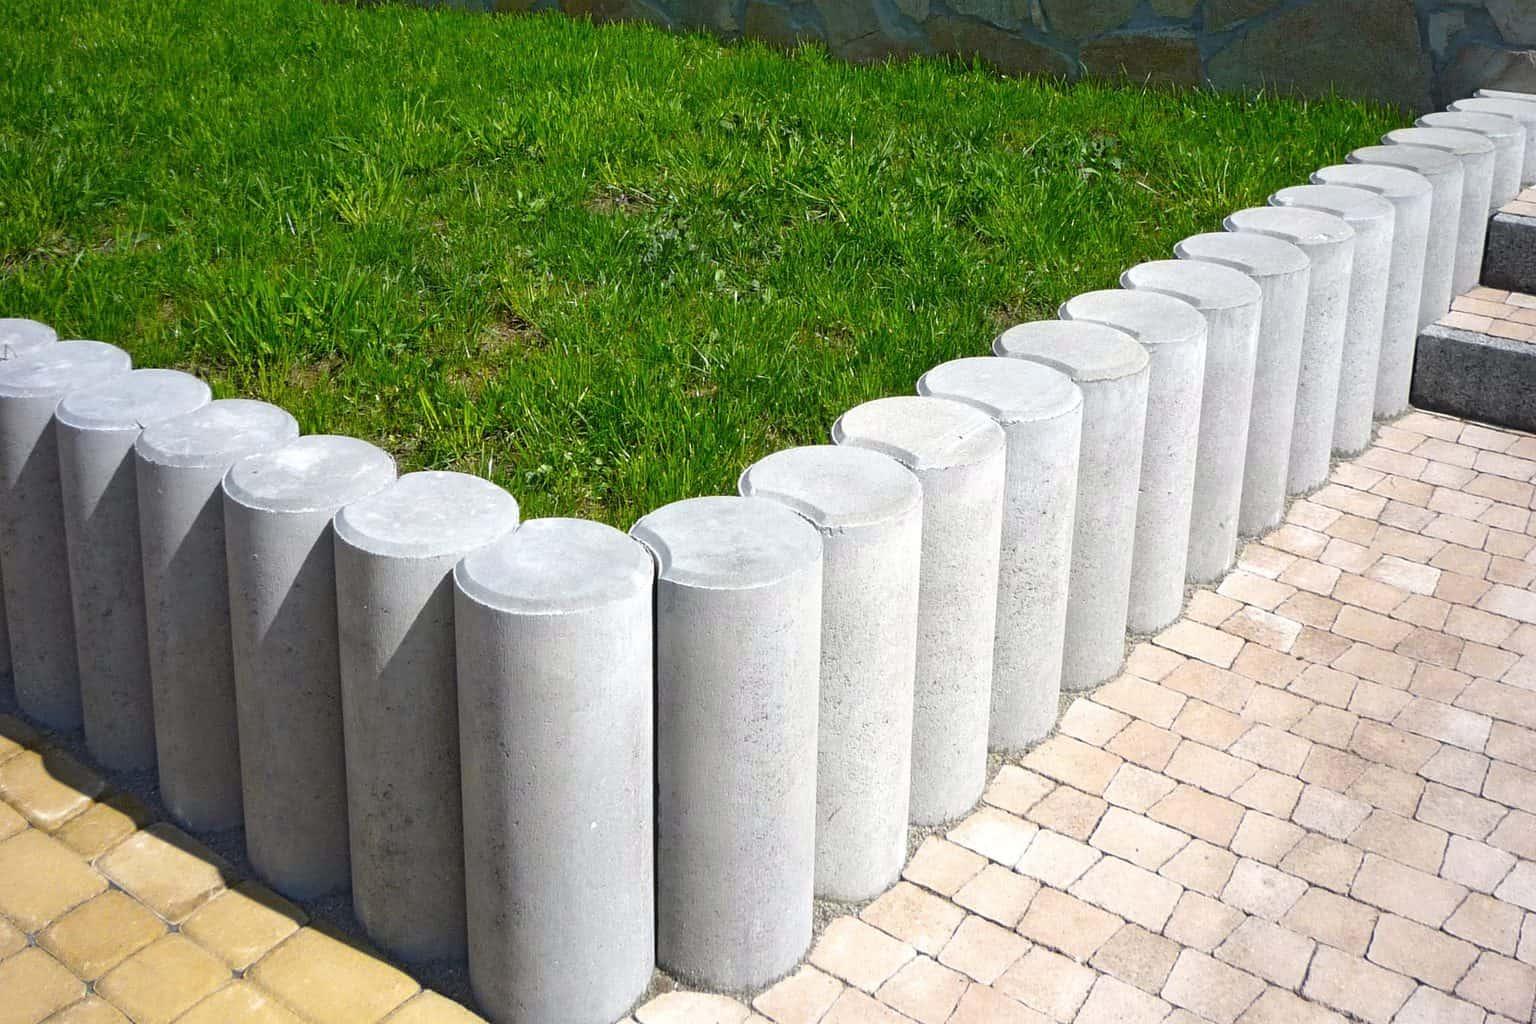 Landscape edging using concrete bollards